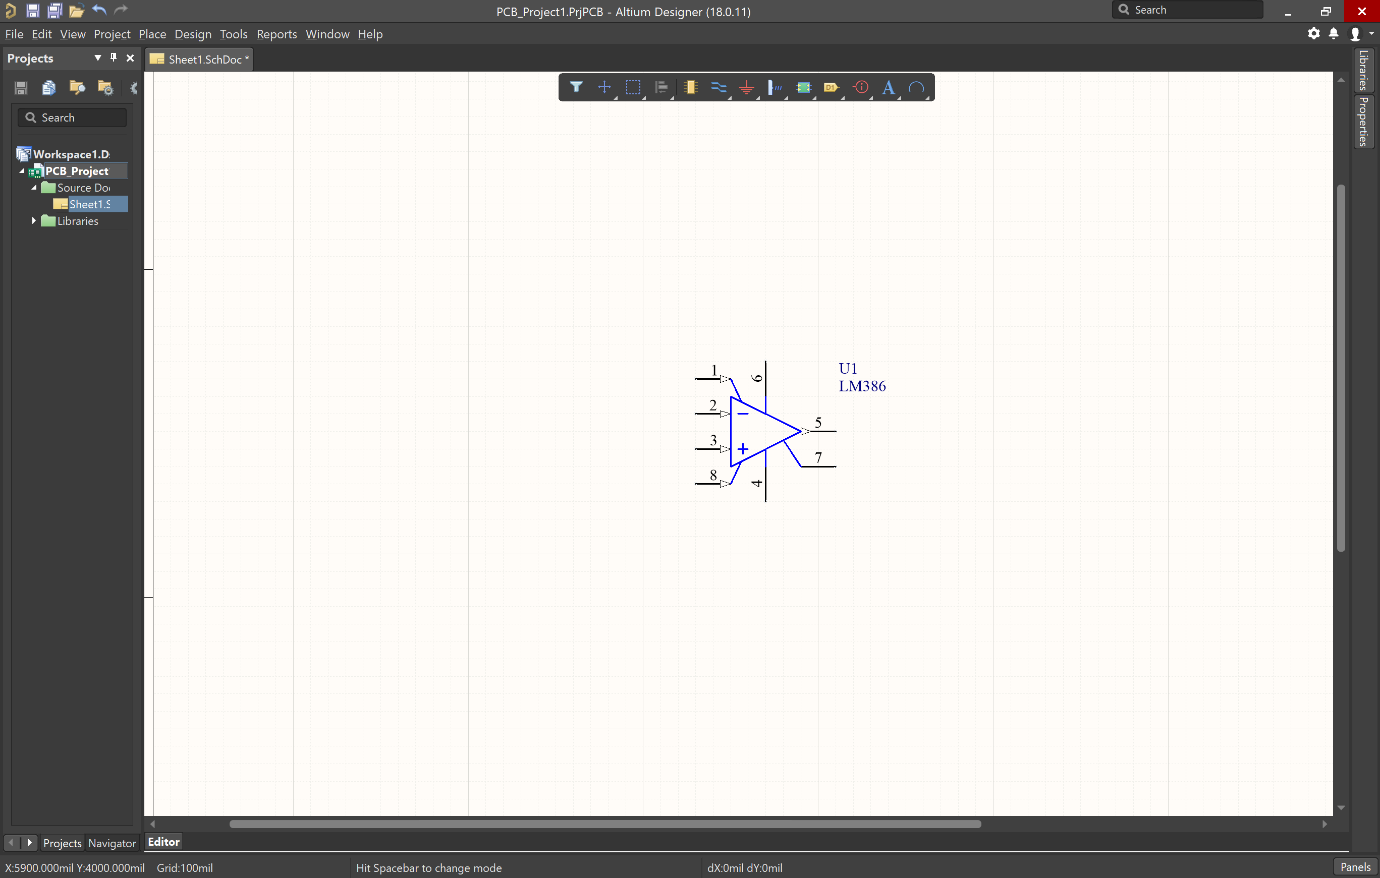 Picture of IC in schematic in Altium